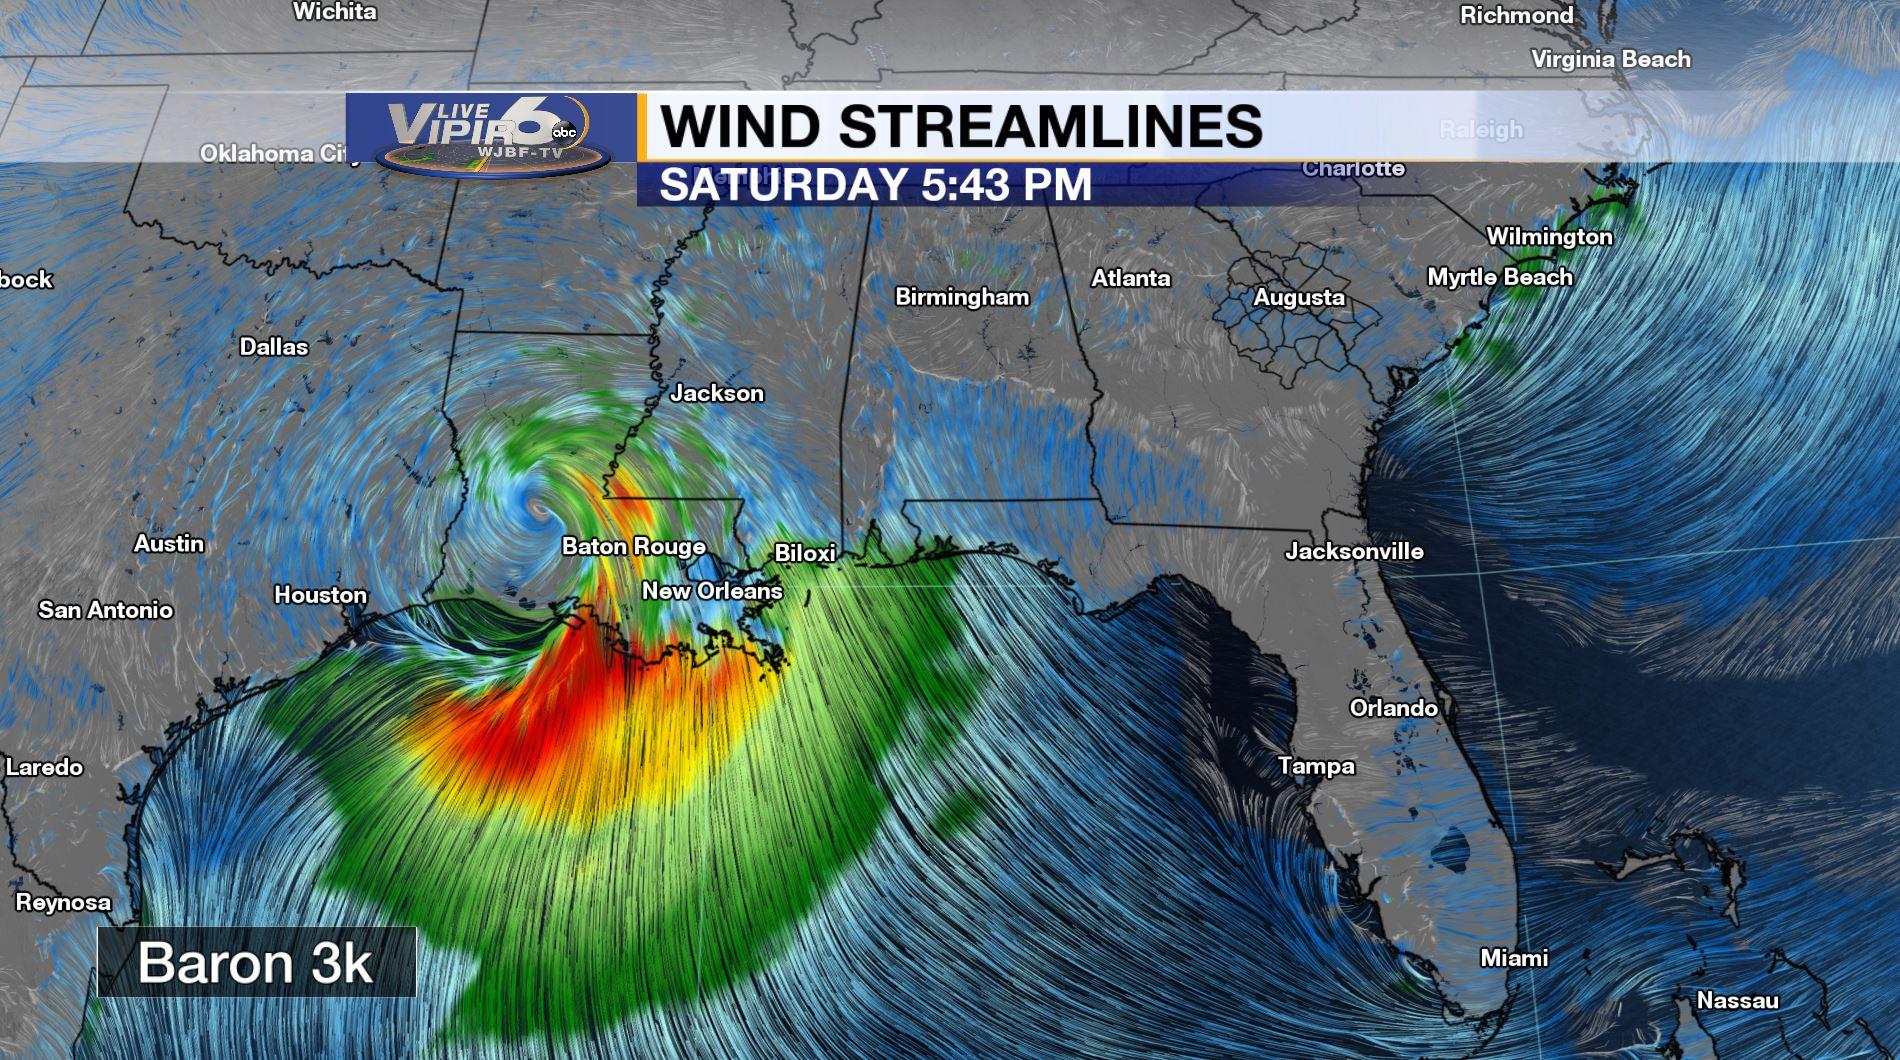 Live Vipir 6 Forecast | WJBF